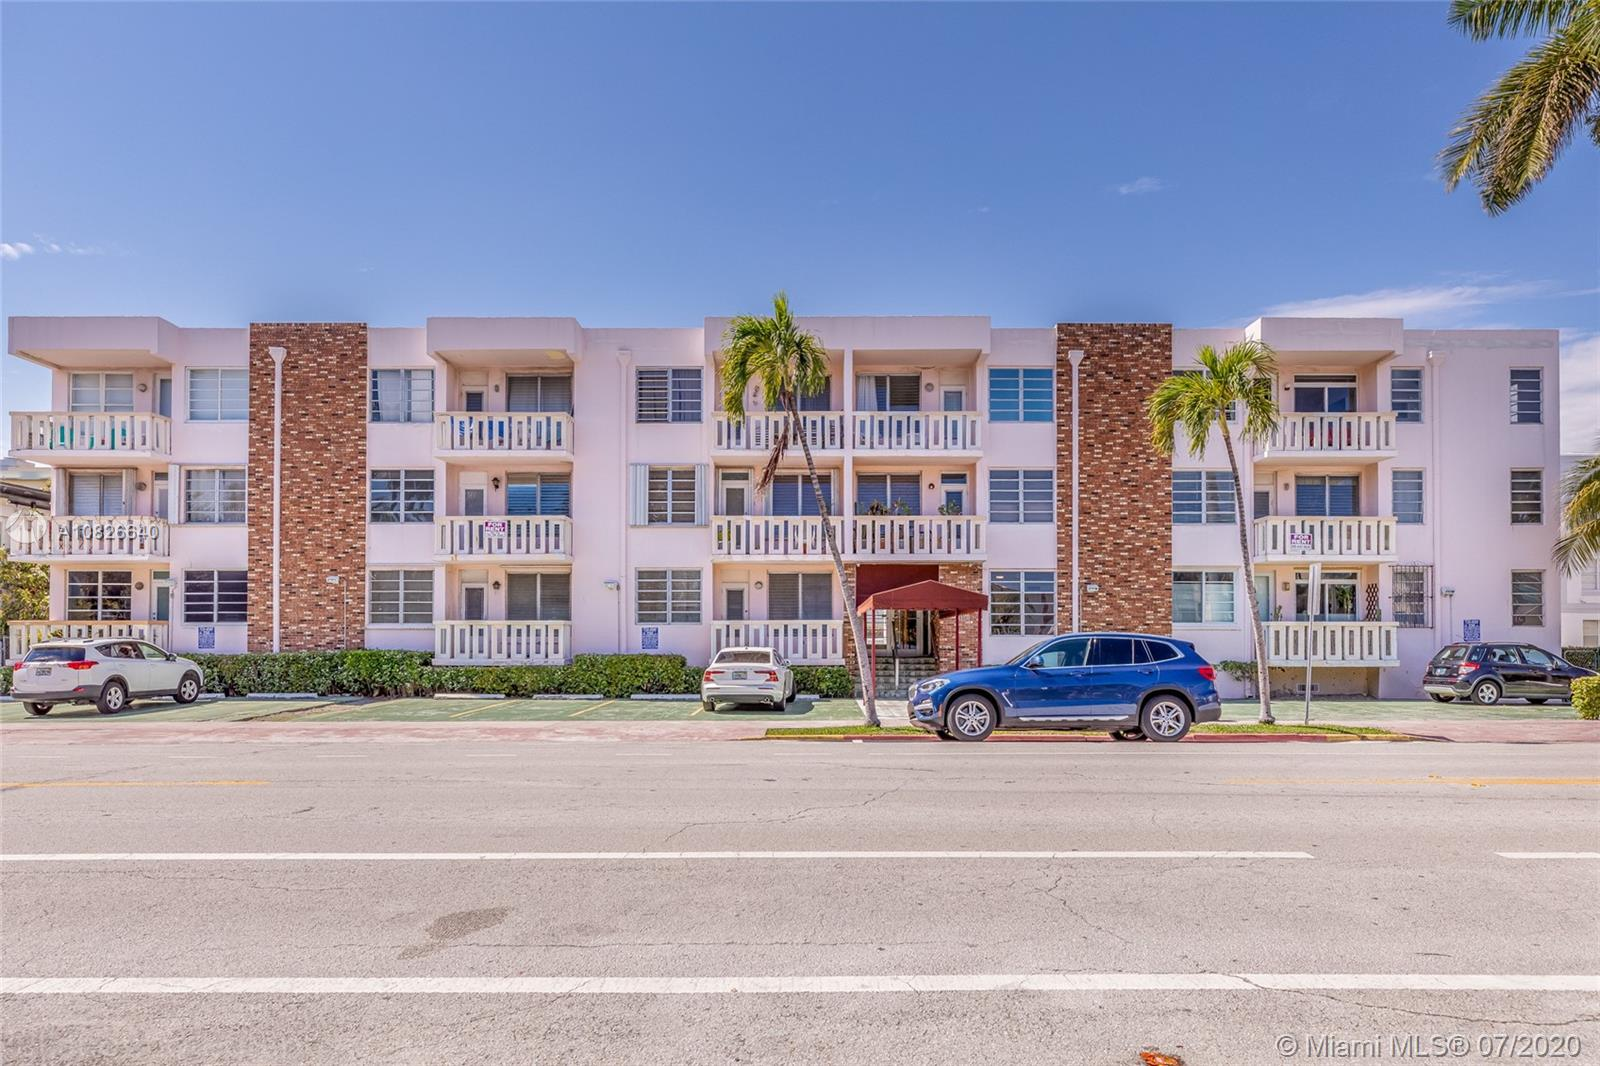 Photo - 1150 Euclid Ave # 203, Miami Beach FL 33139